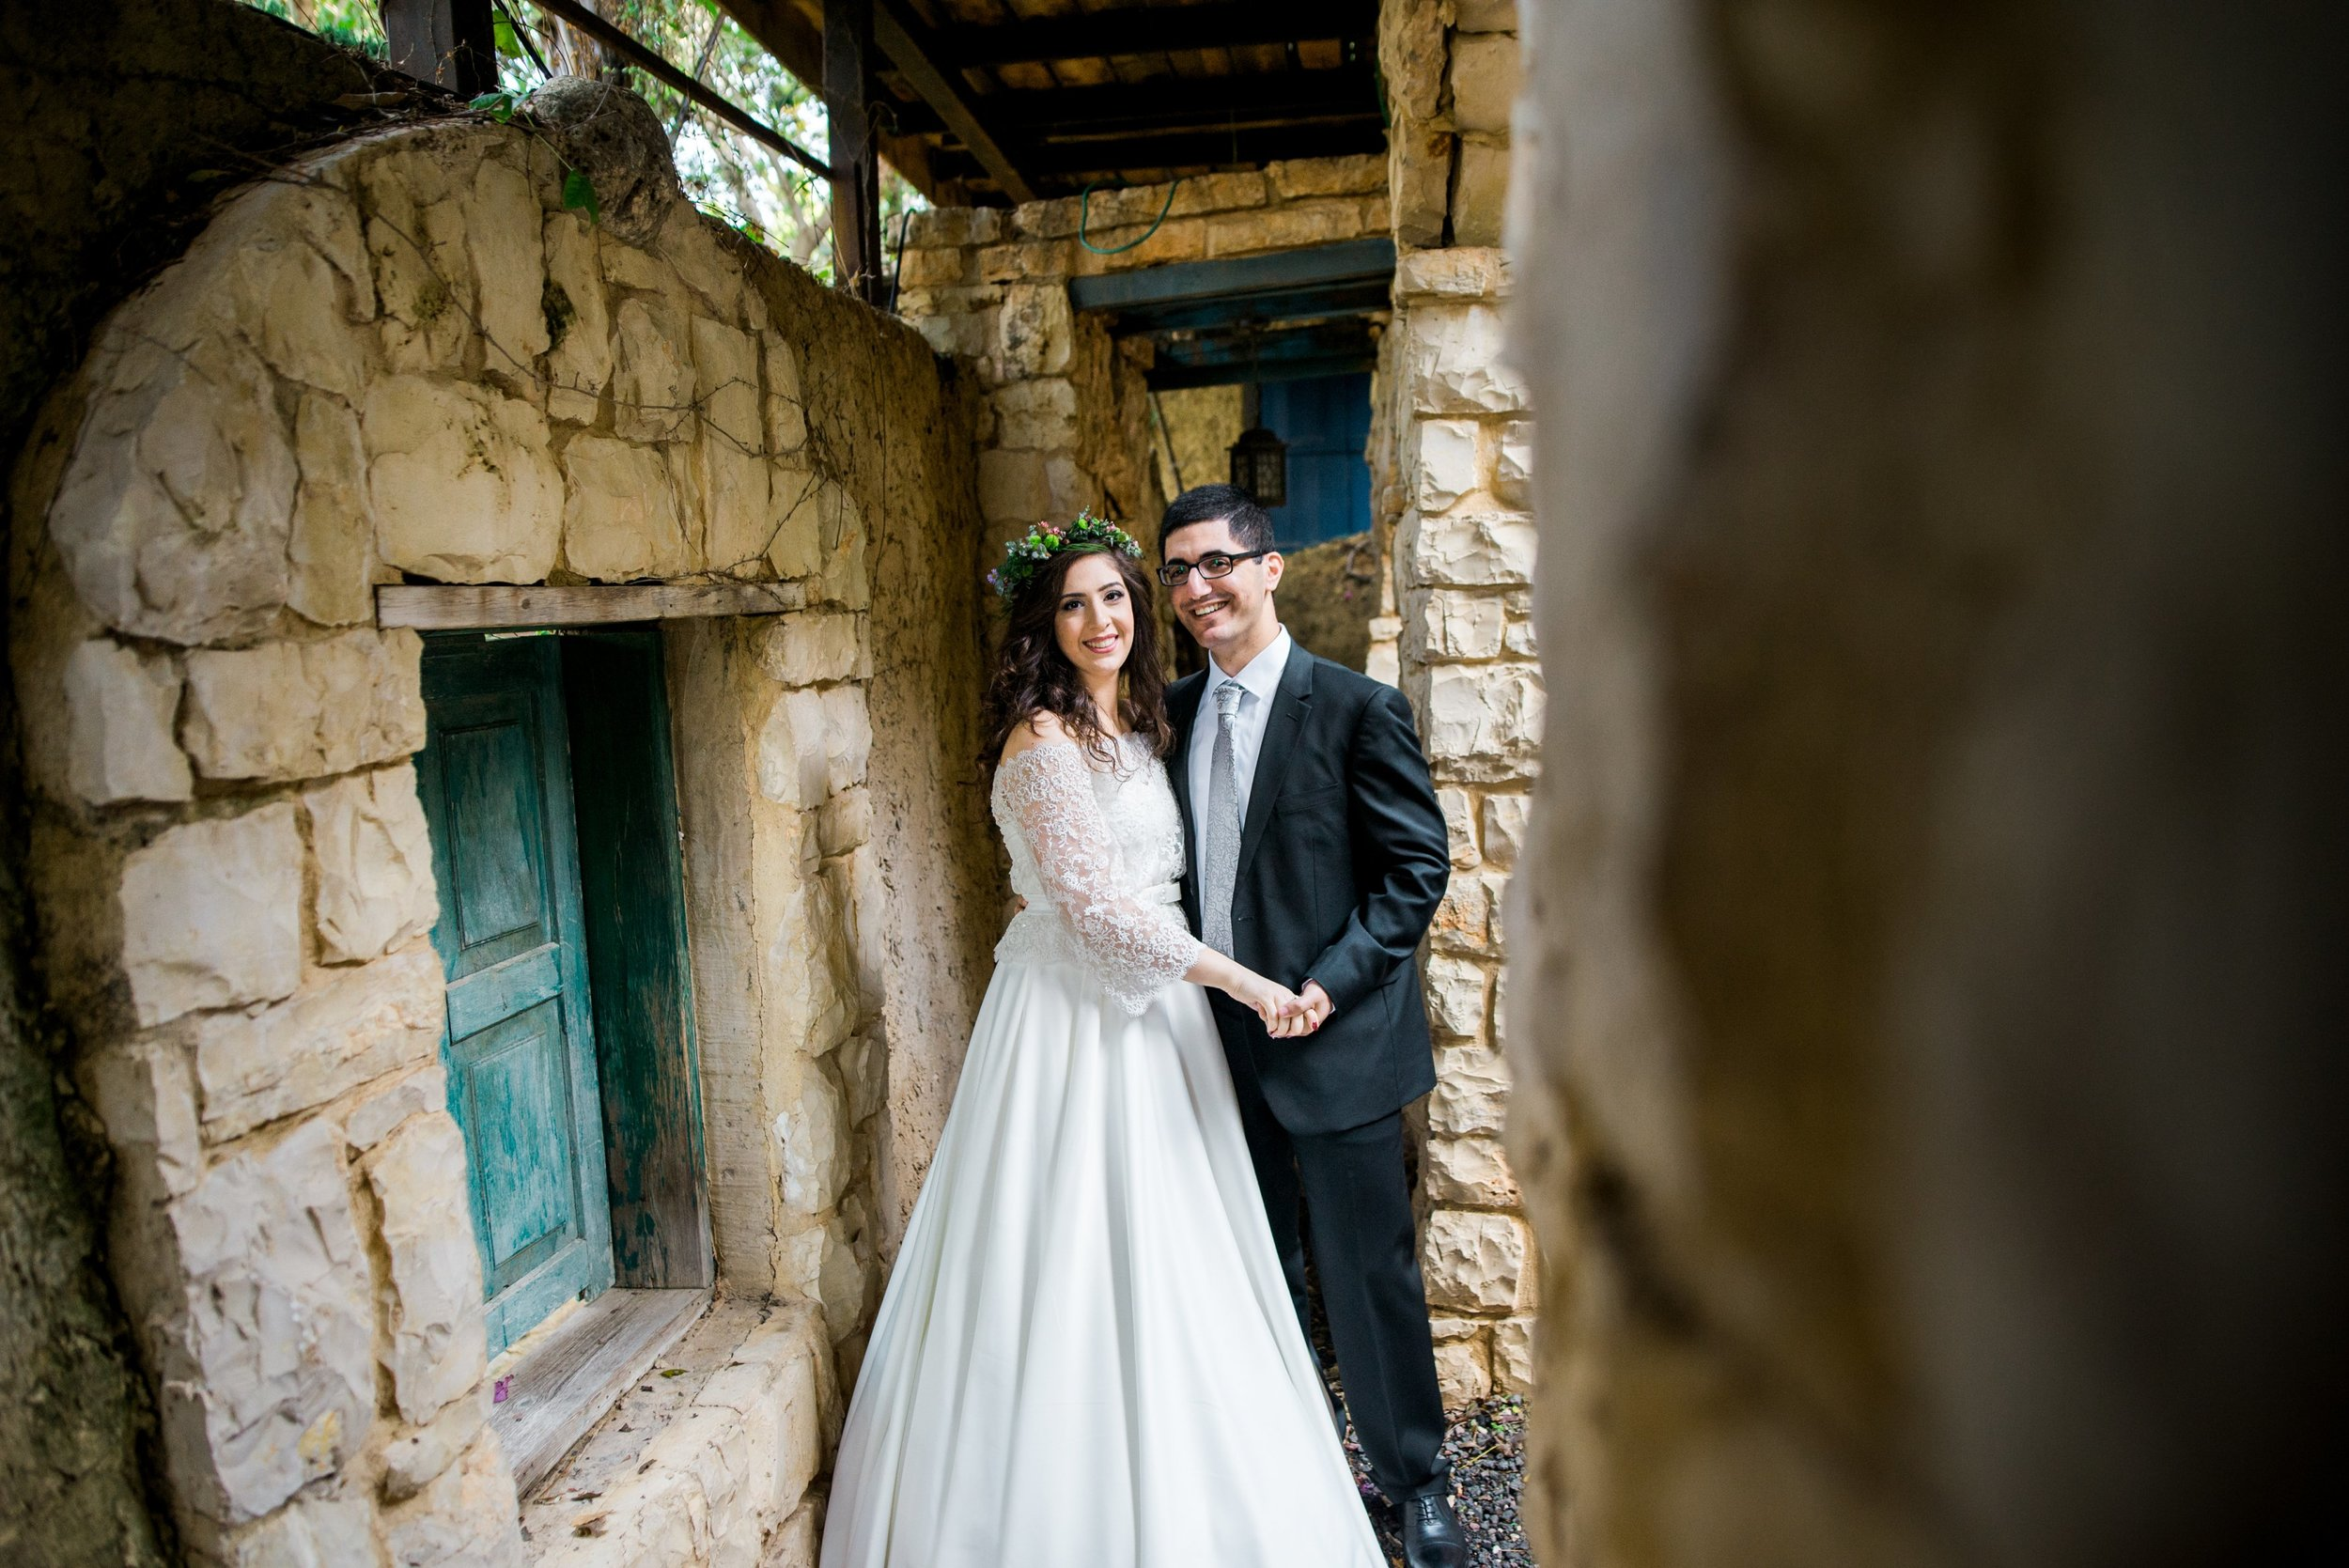 israel-garden-wedding-portraits-session-kate-giryes-photography--8_WEB.jpg